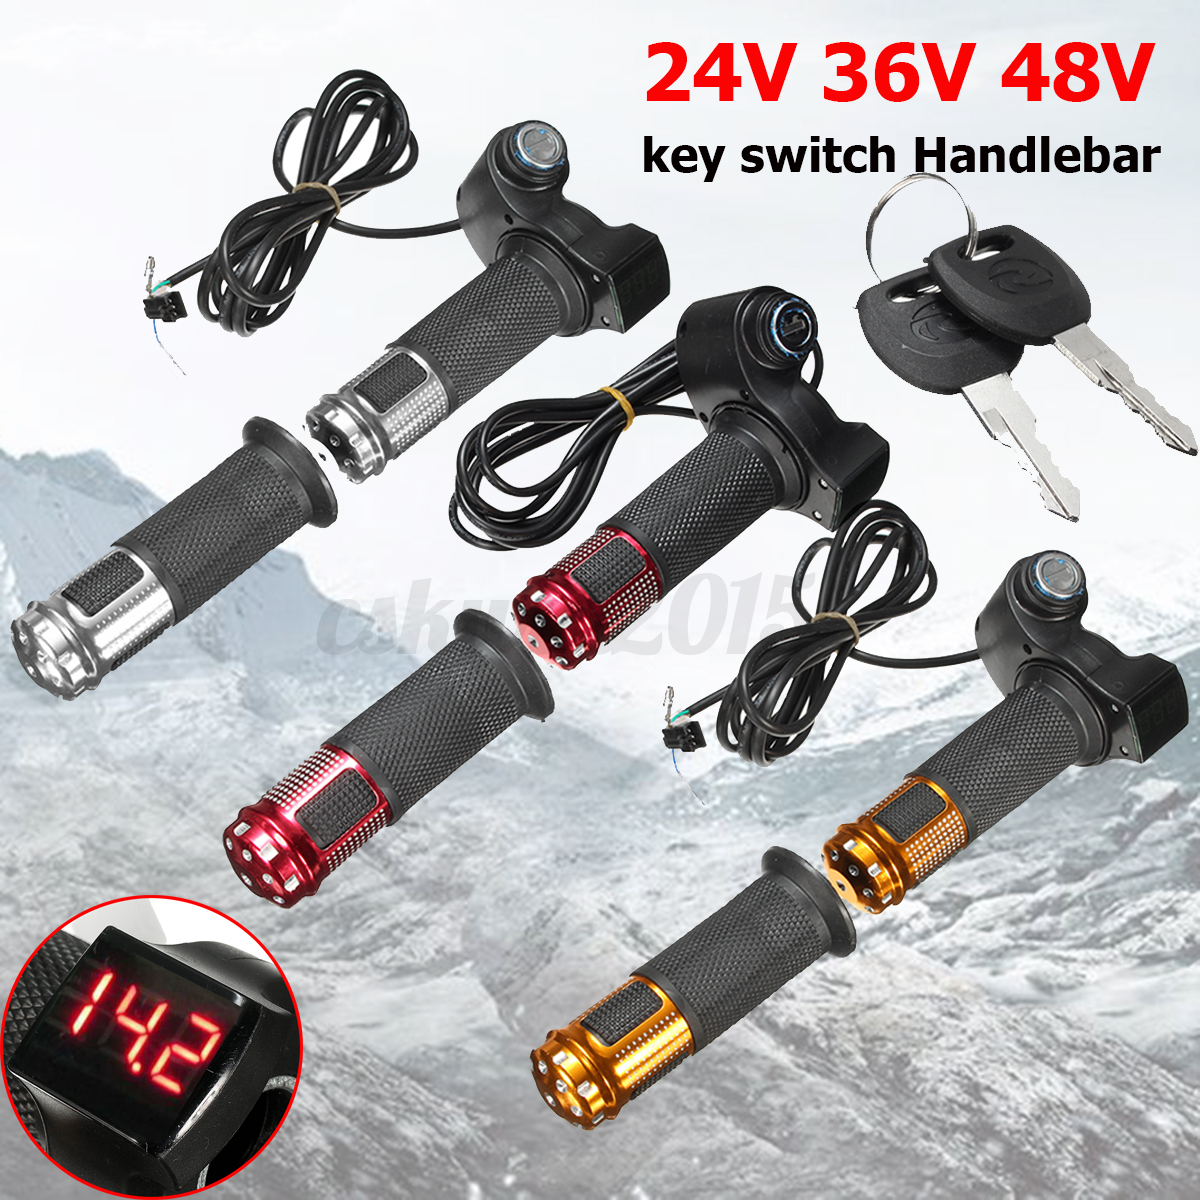 24v 36v 48v Electric Scooter Bike Throttle Grip Handlebar + Key Switch Led Meter - unbranded/generic - ebay.co.uk